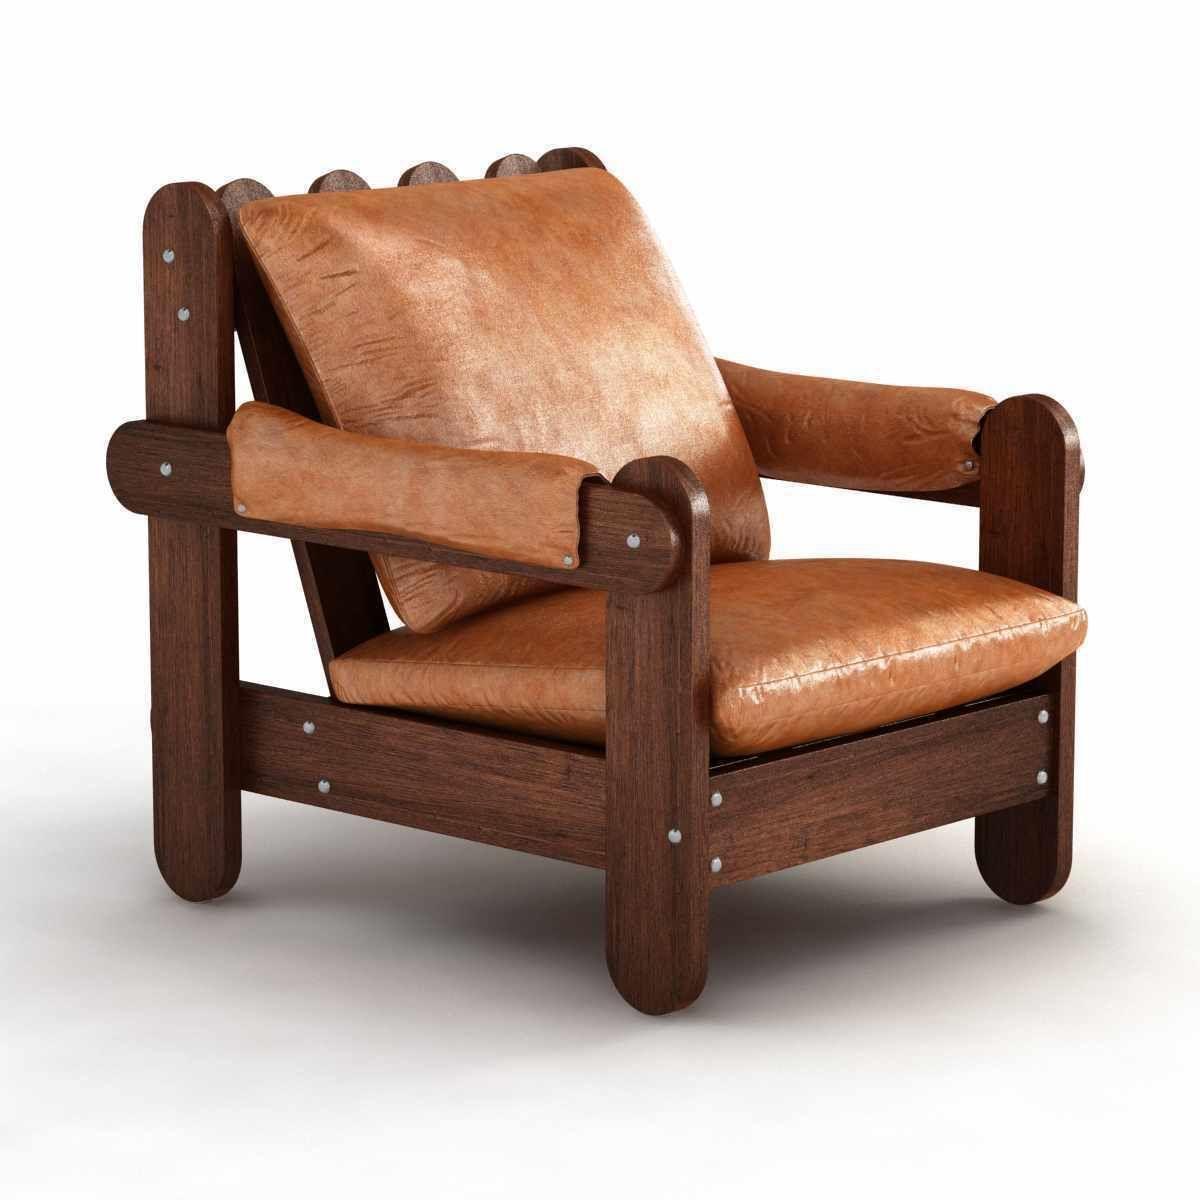 Fantastic Vintage Mid Century Brazilian Lounge Chair 3D Model 3D Model Ibusinesslaw Wood Chair Design Ideas Ibusinesslaworg